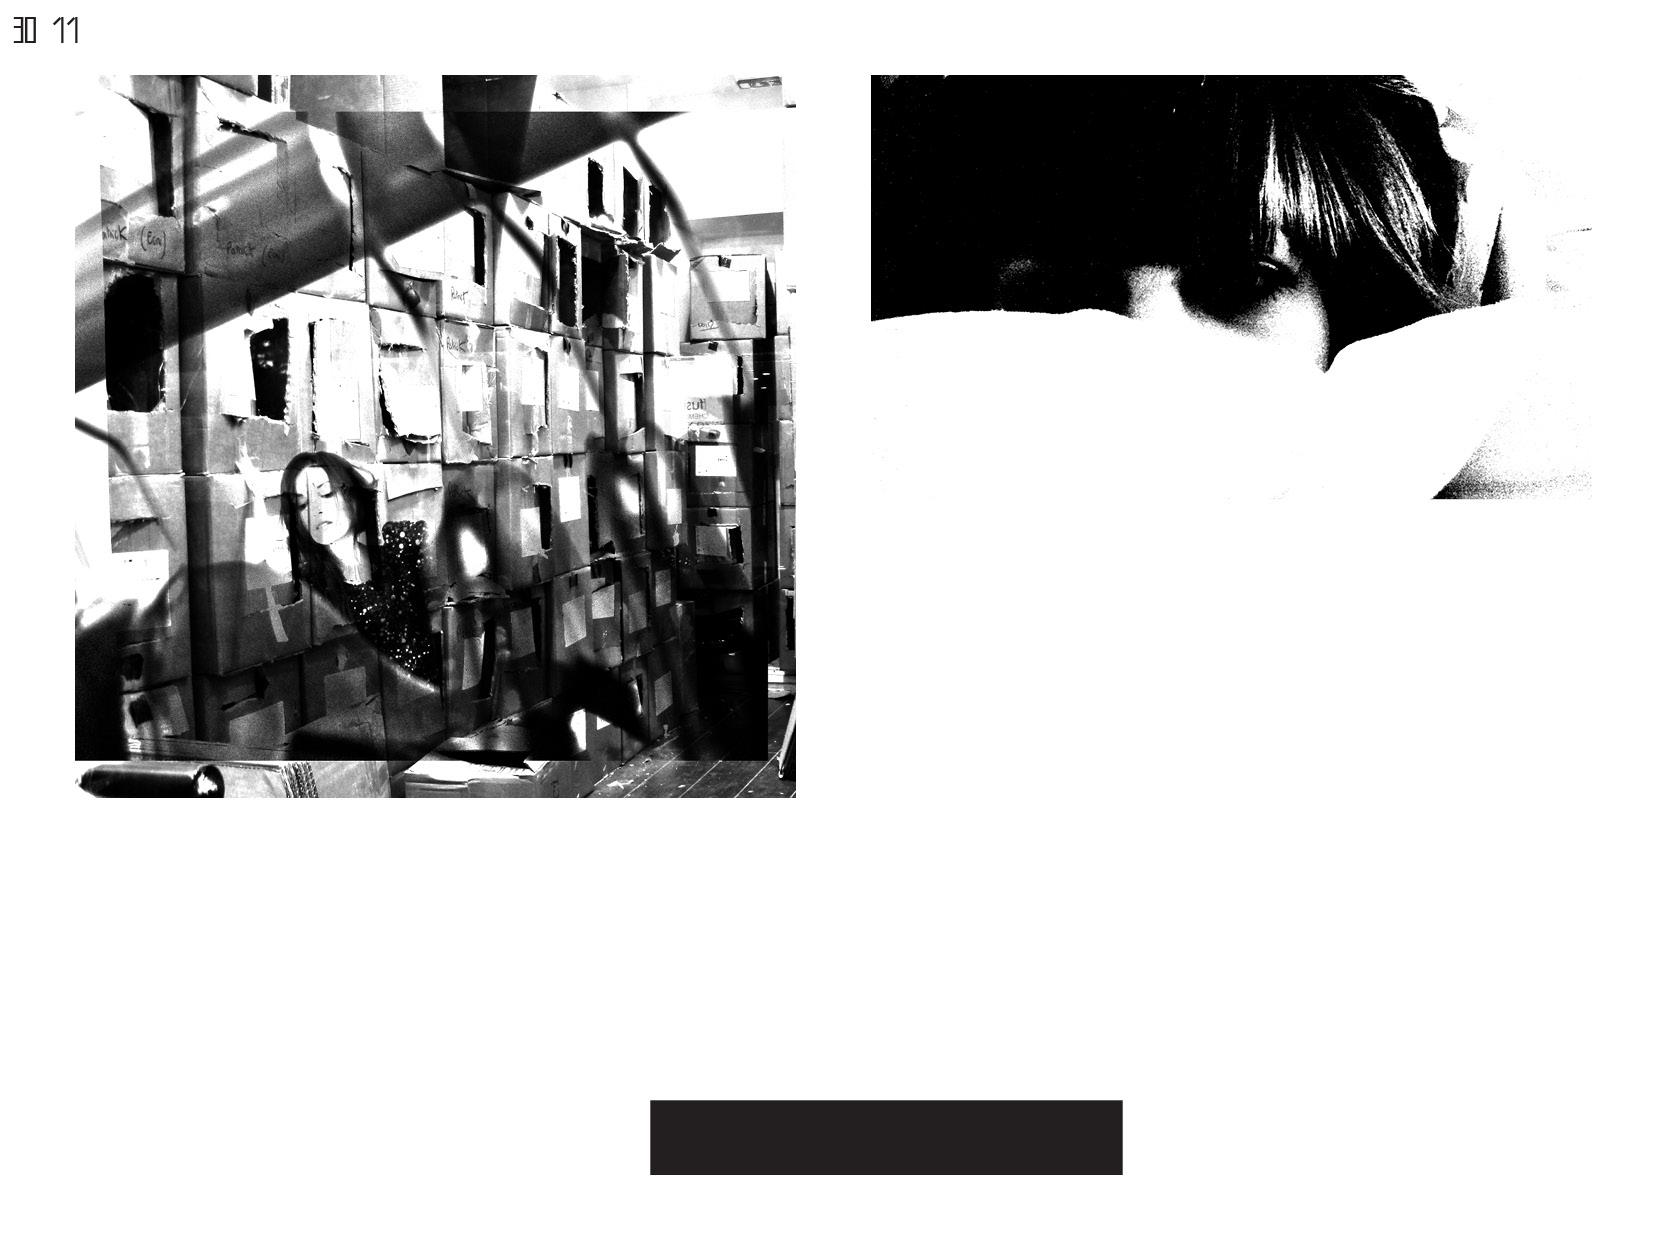 Gerrit-Schweiger-Dialog-Städte-Paris-Berlin-Jessica-Blank-Experiment-Fotoserie-Tagebuch-visuelle-Kommunikation-45